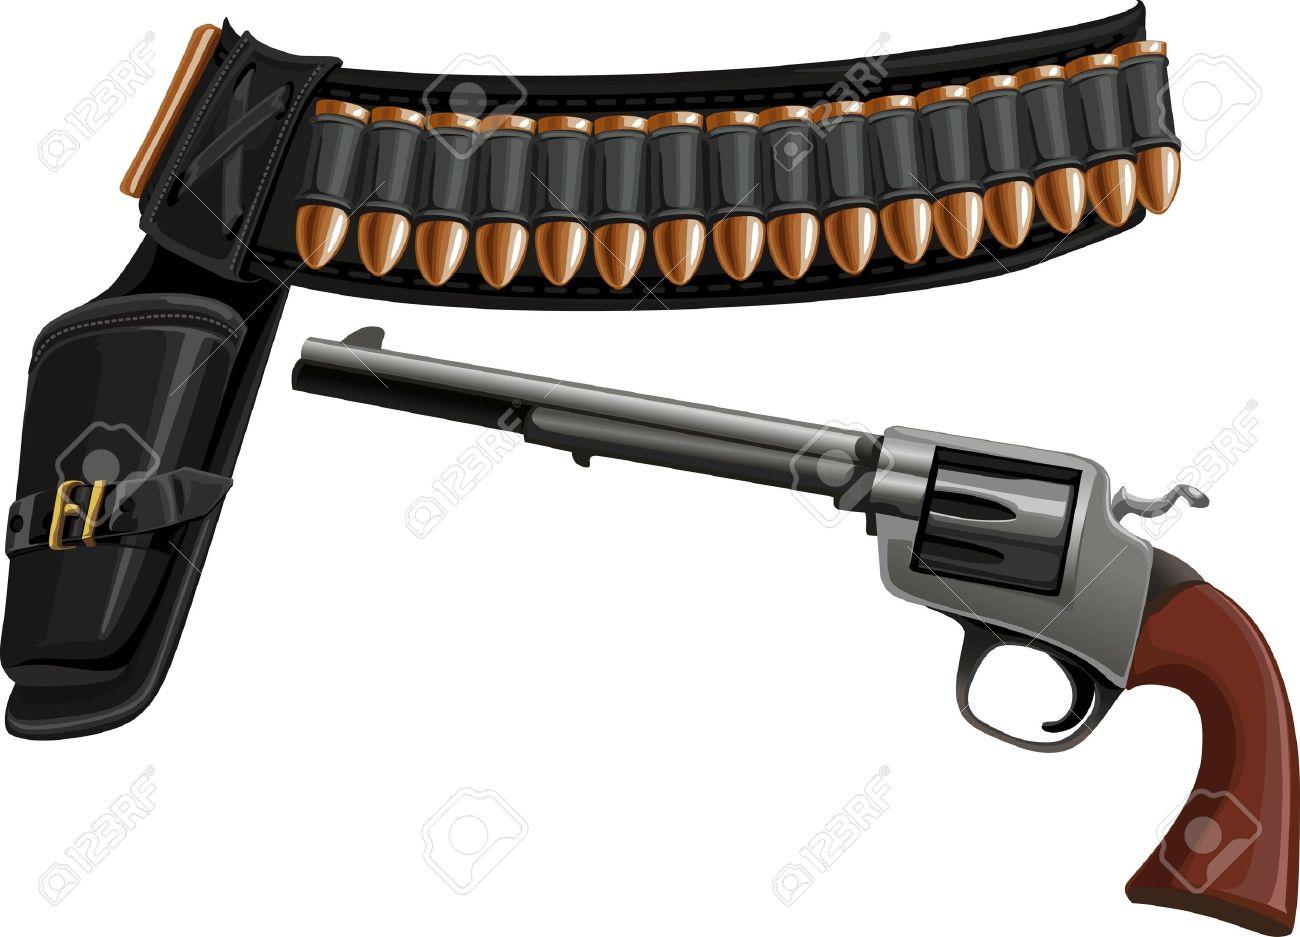 revolver, a belt holster and ammunition Stock Vector - 15660764